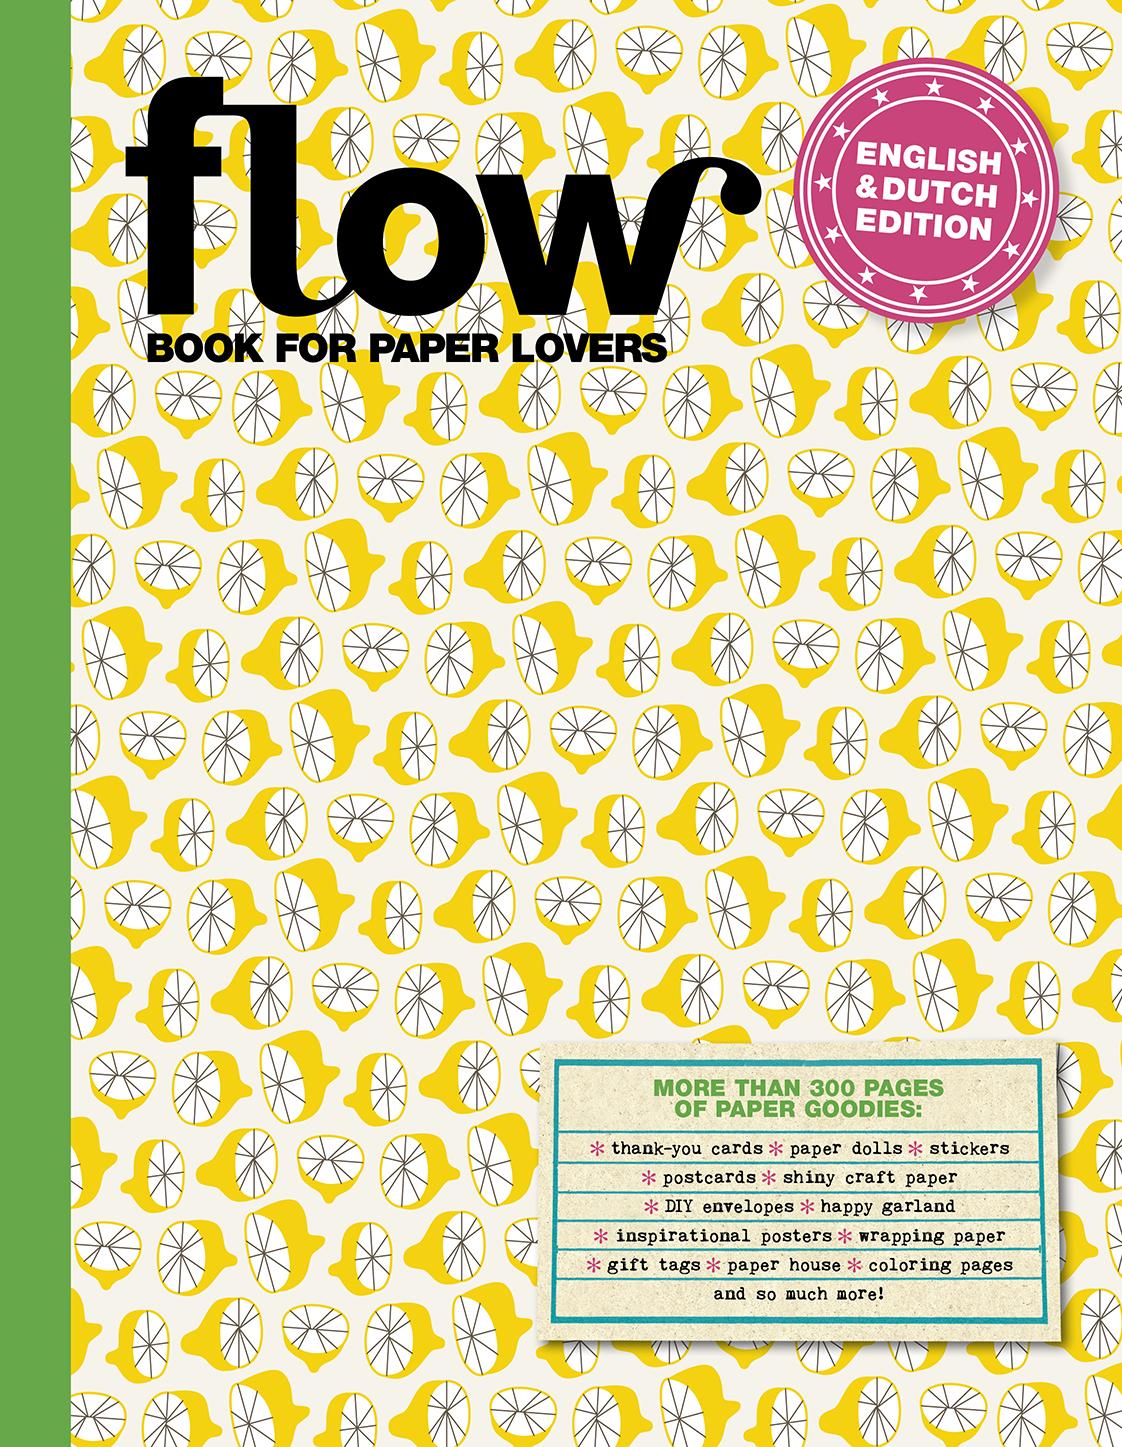 FLOWBookforPaperlovers2014_Medium